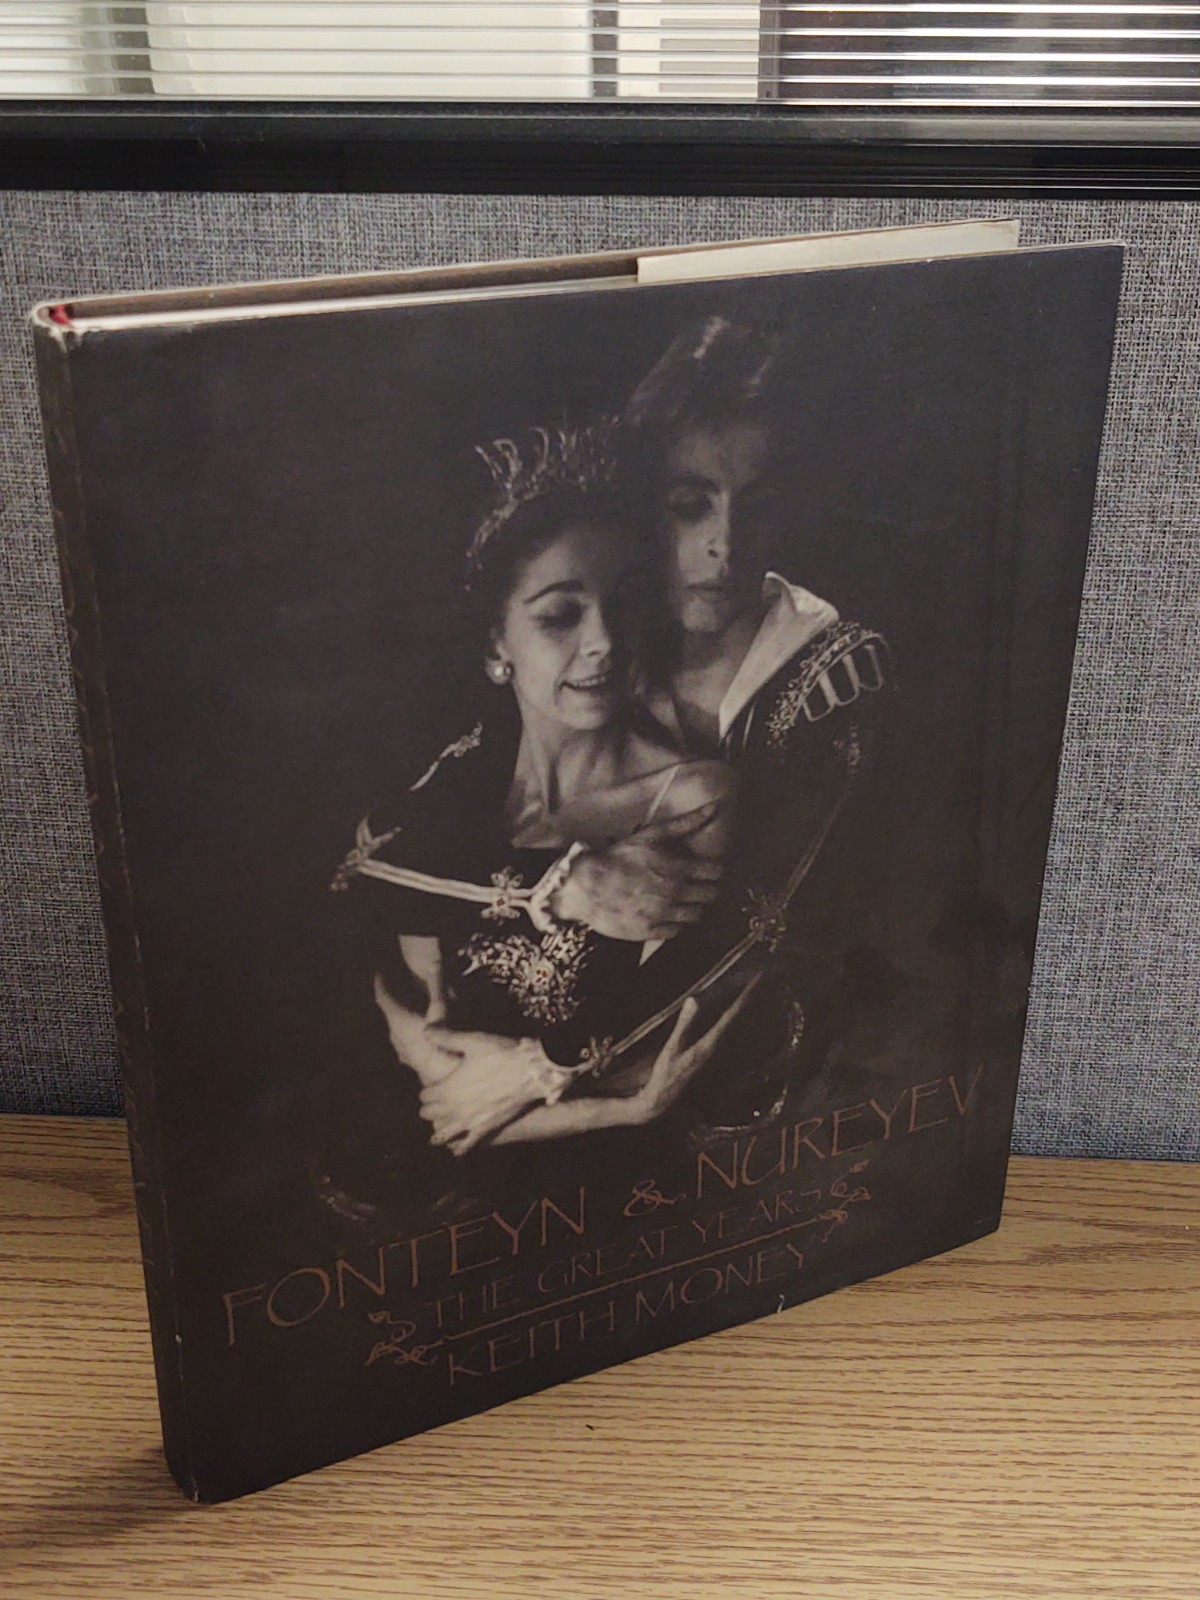 Fonteyn and Nureyev: The Great Years - Money, Keith